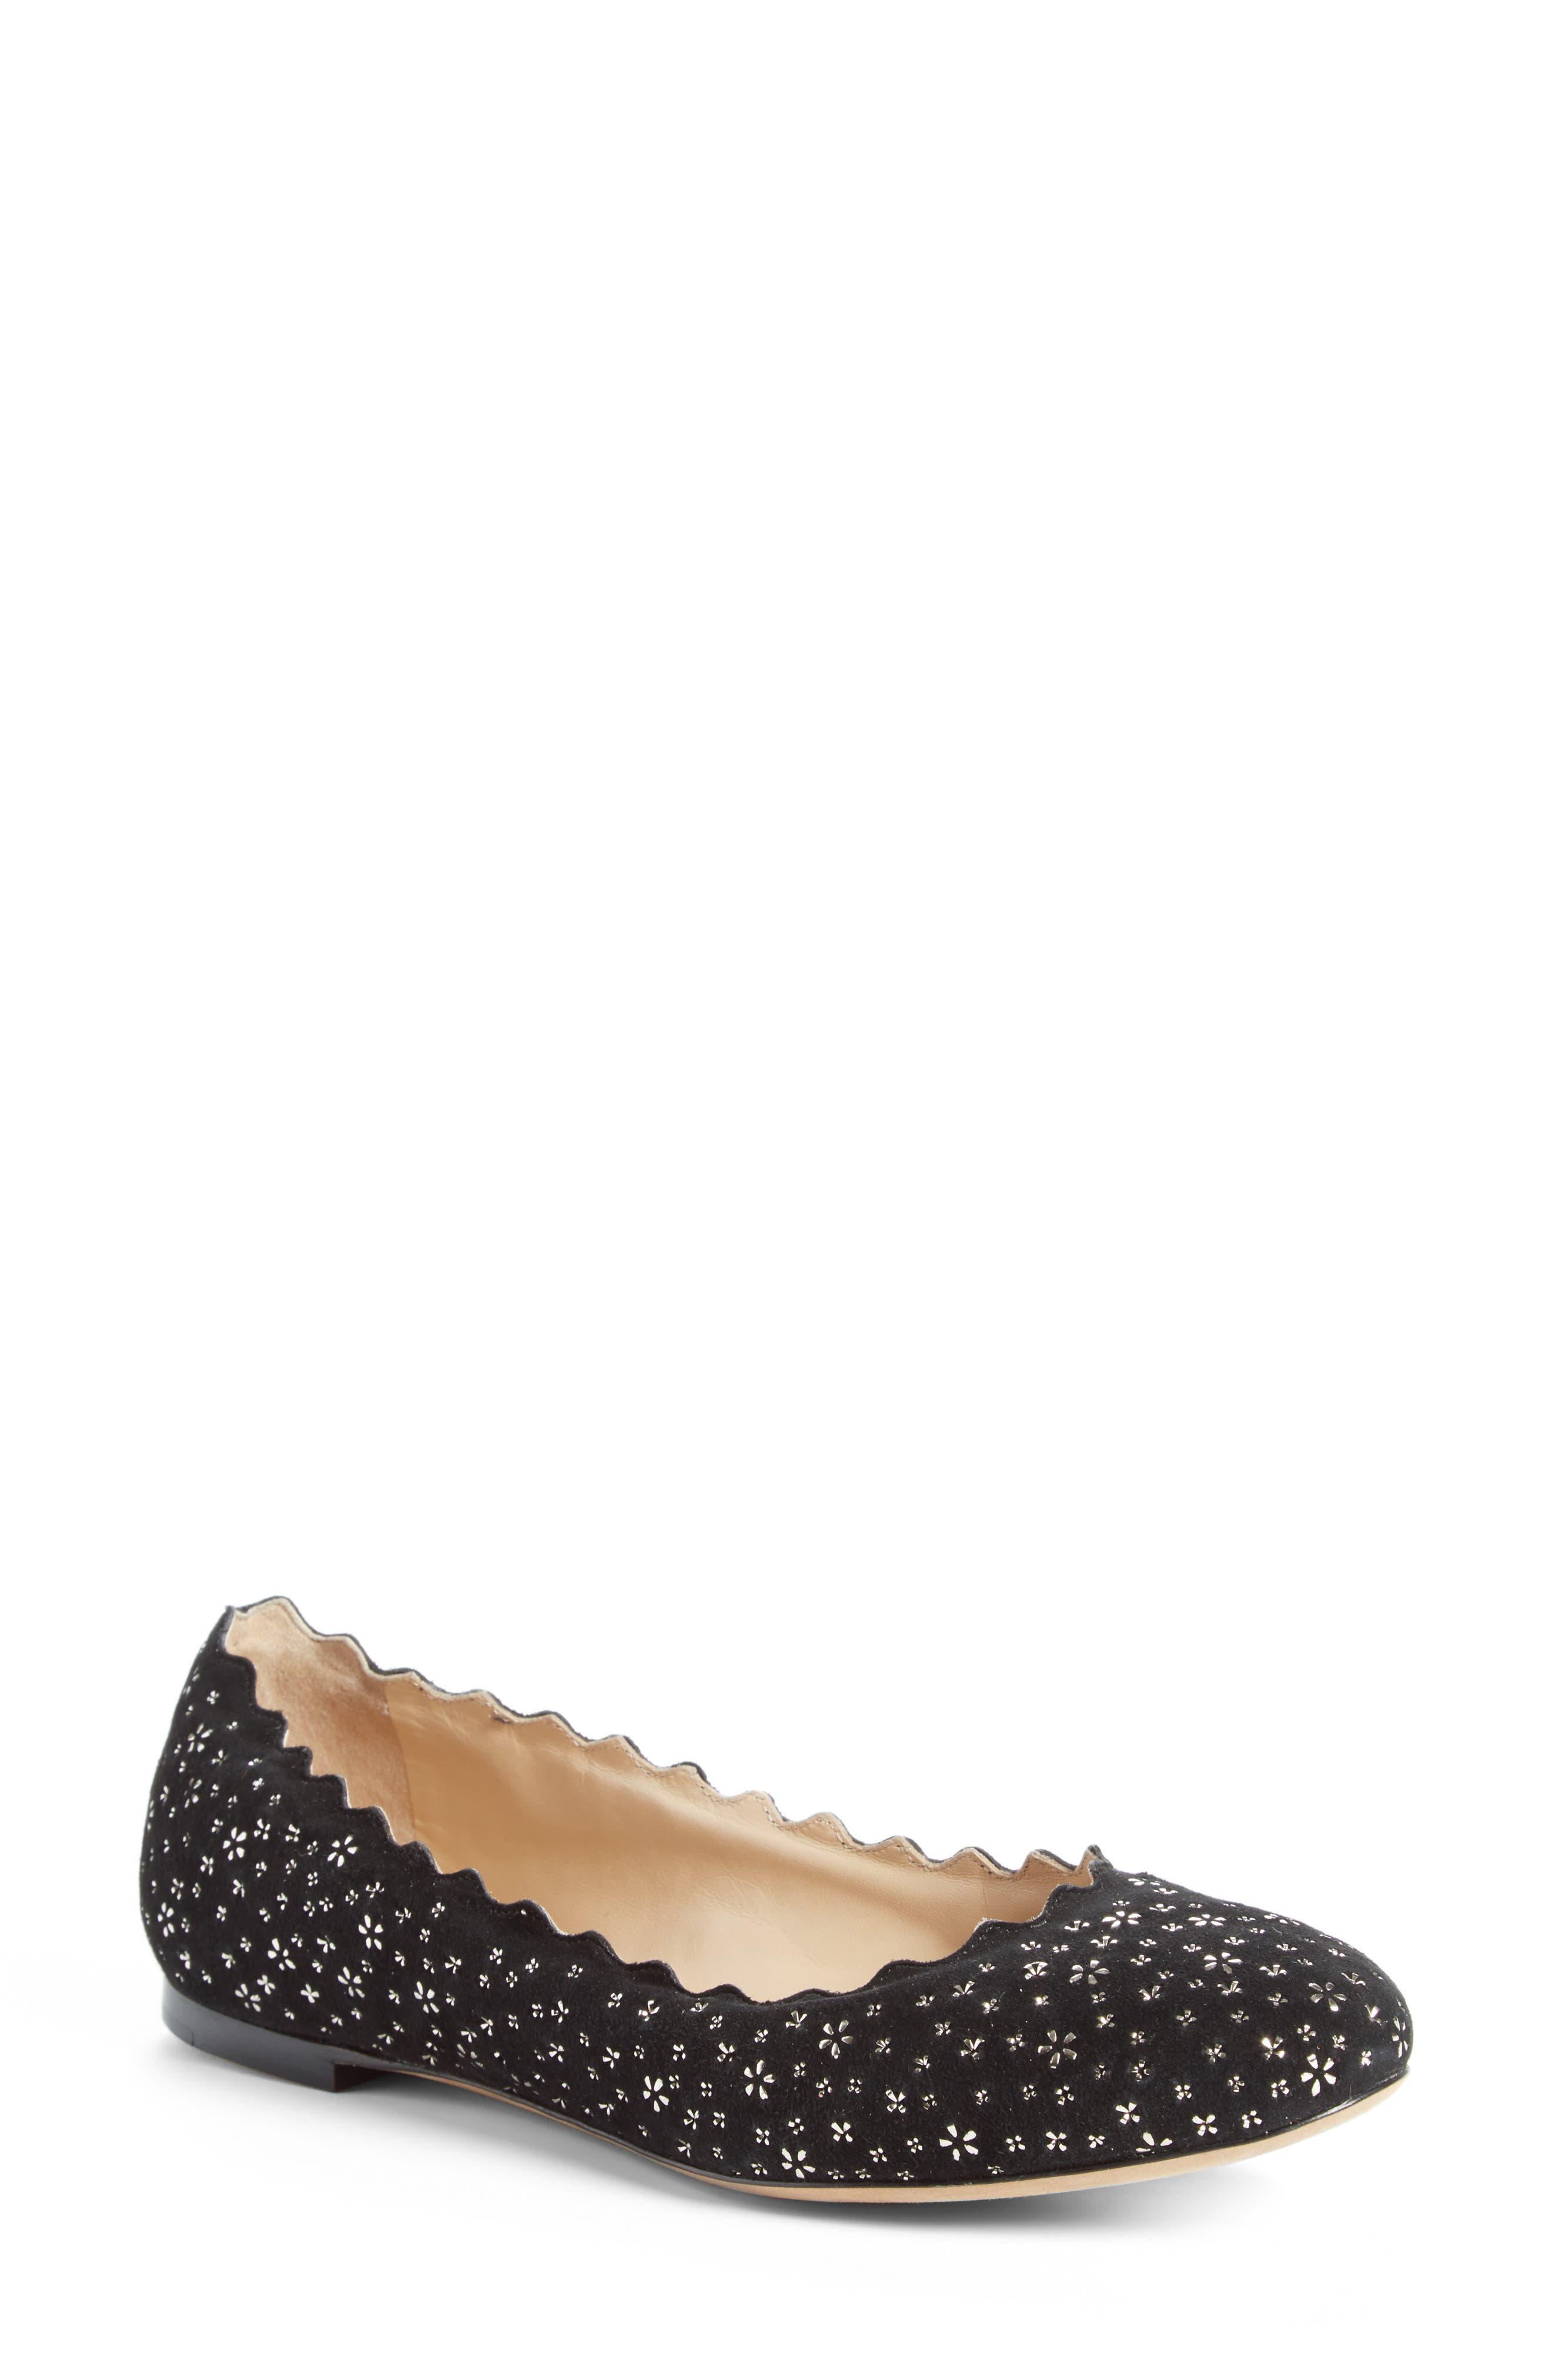 Lauren Scalloped Ballerina Flat,                         Main,                         color, Black Floral